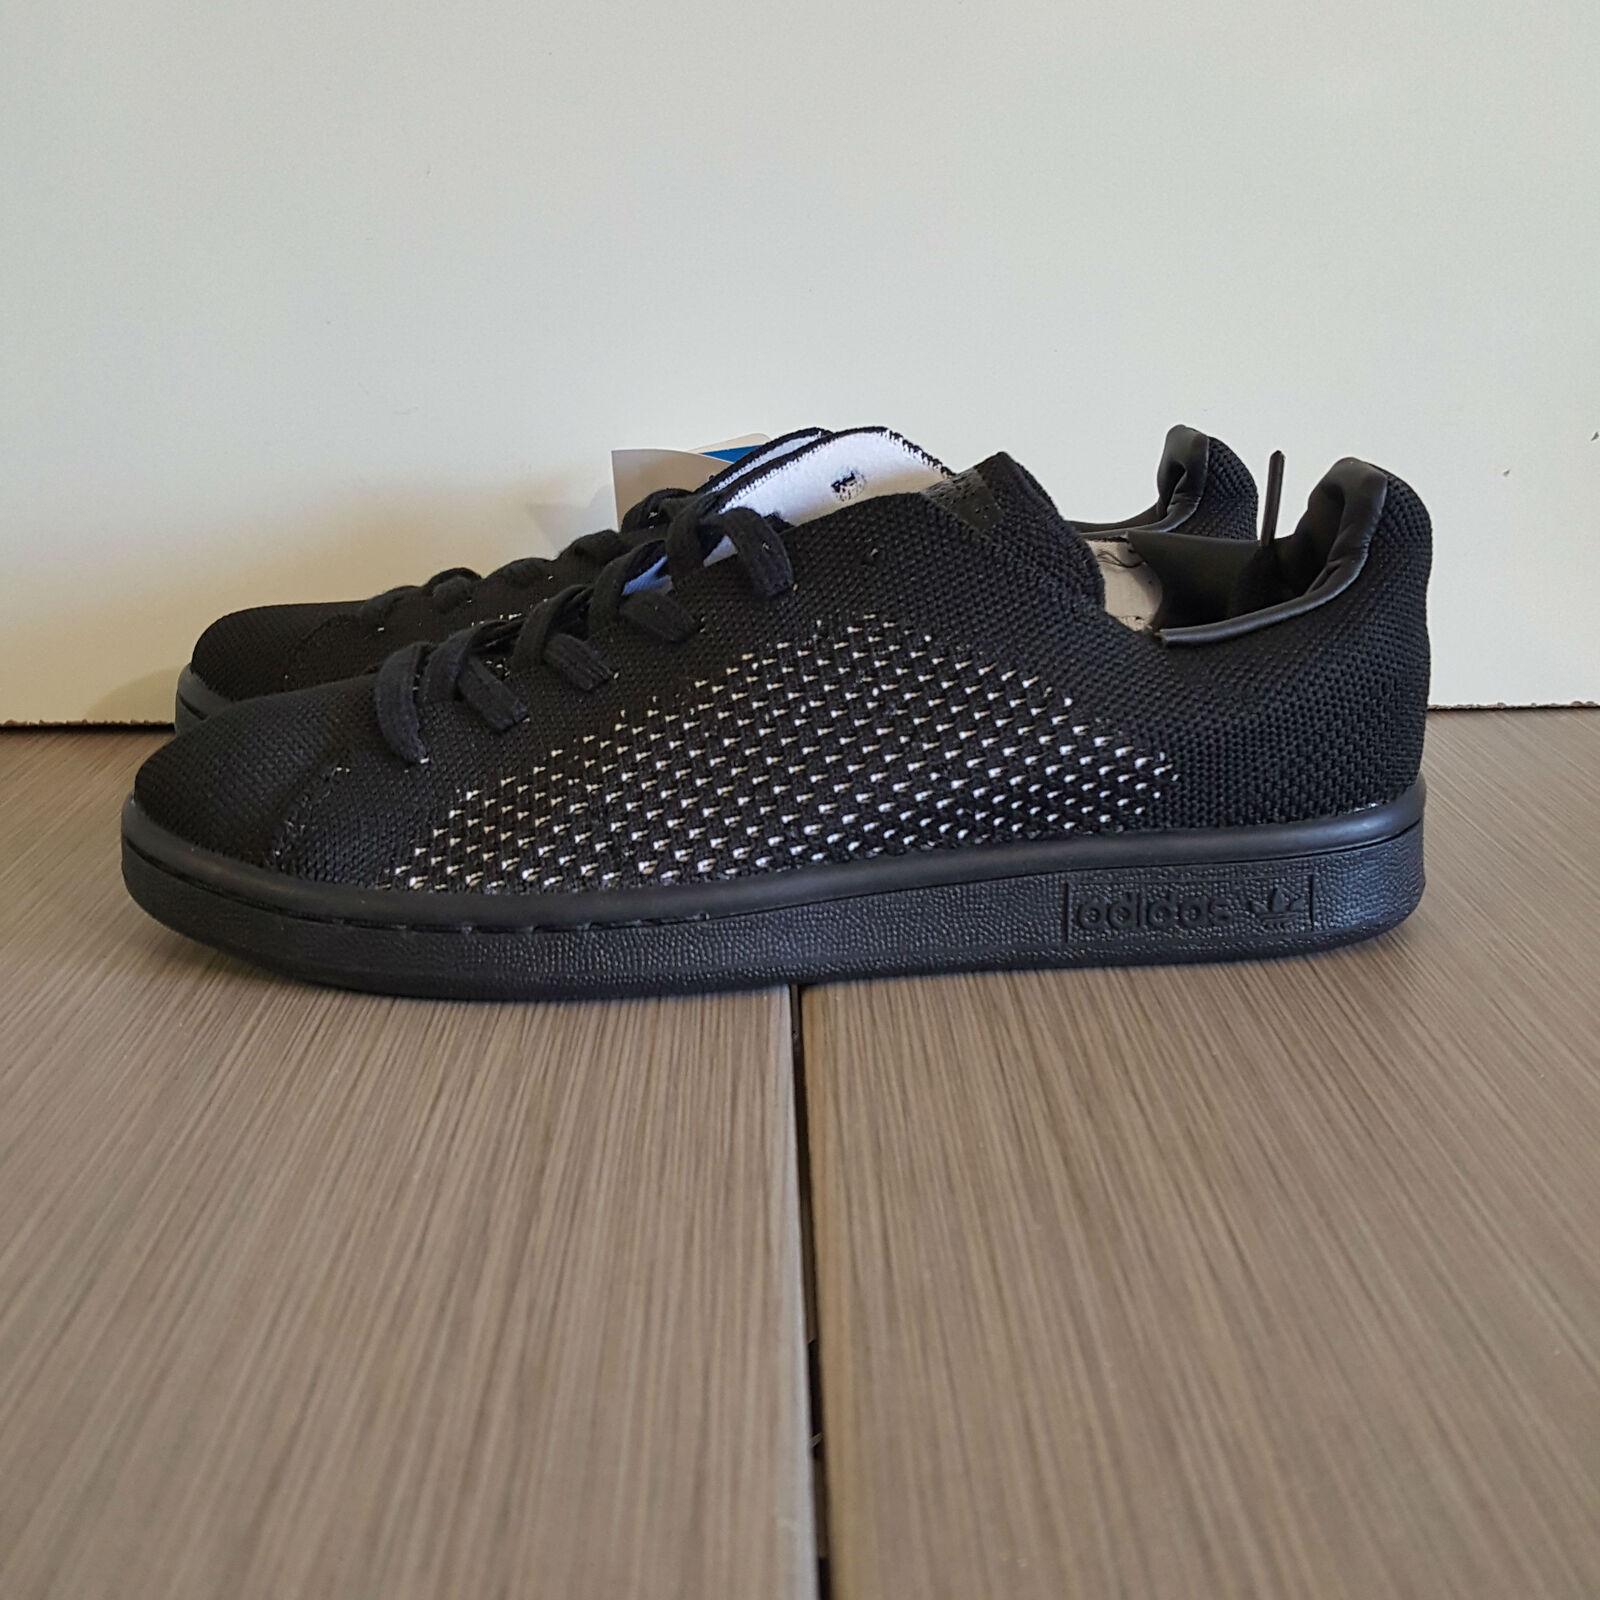 Free Shipping!!! adidas Stan Smith Primeknit Core Nero AF4452